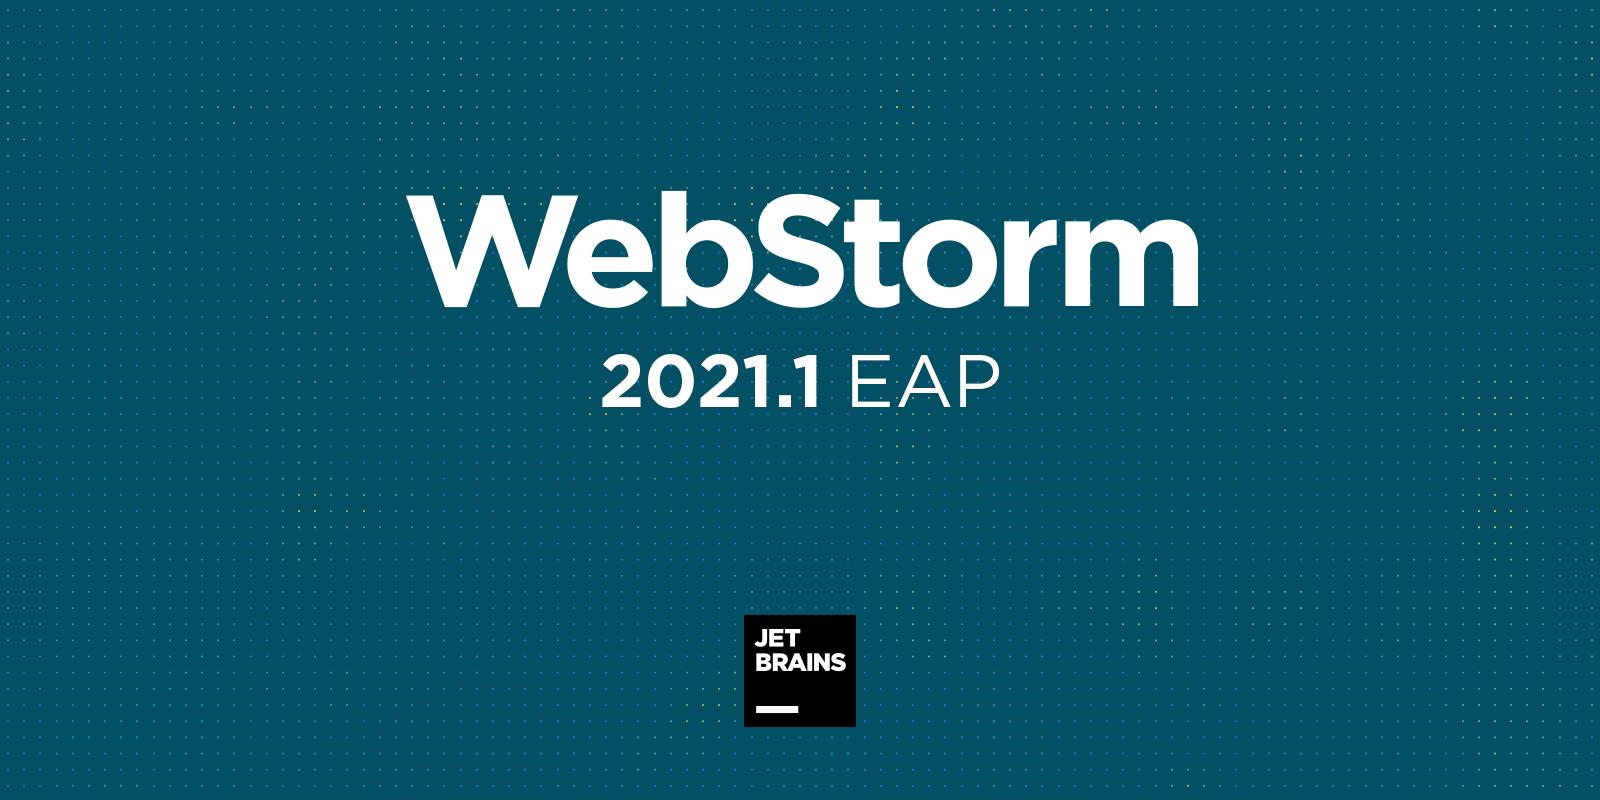 ws-eap-2021-1